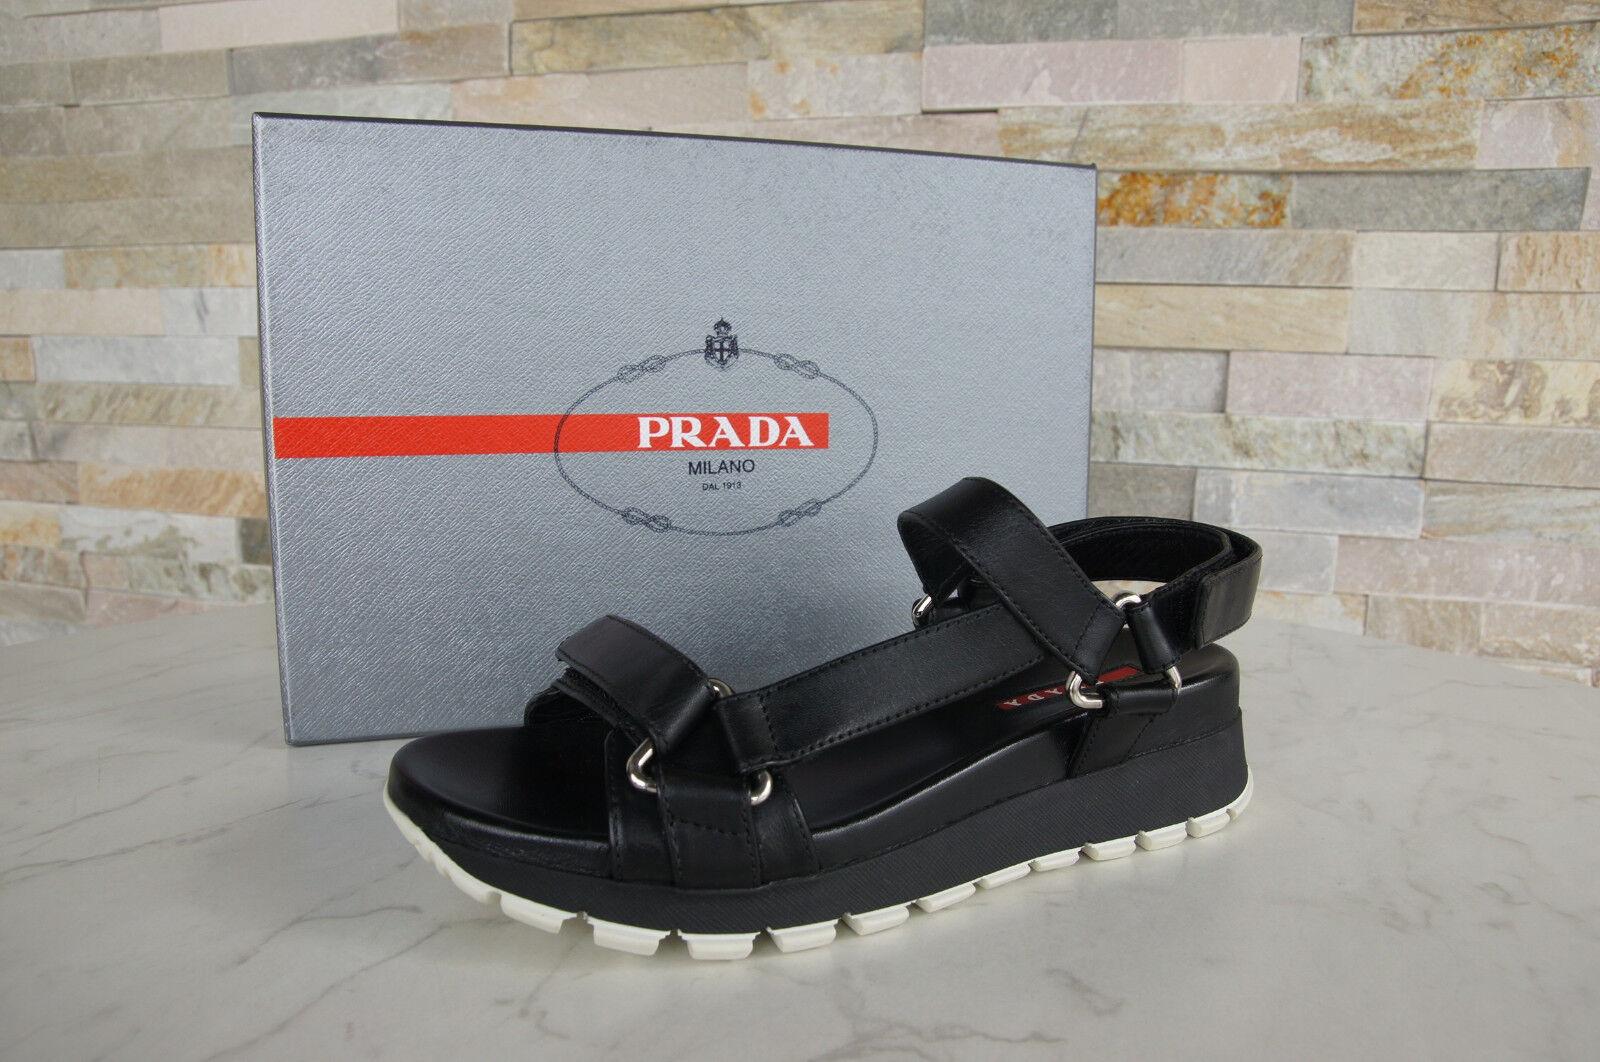 PRADA TAGLIA Scarpe 35 Sandali Sandals 3x6143 Scarpe TAGLIA Velcro nero NUOVO UVP 35e4bd